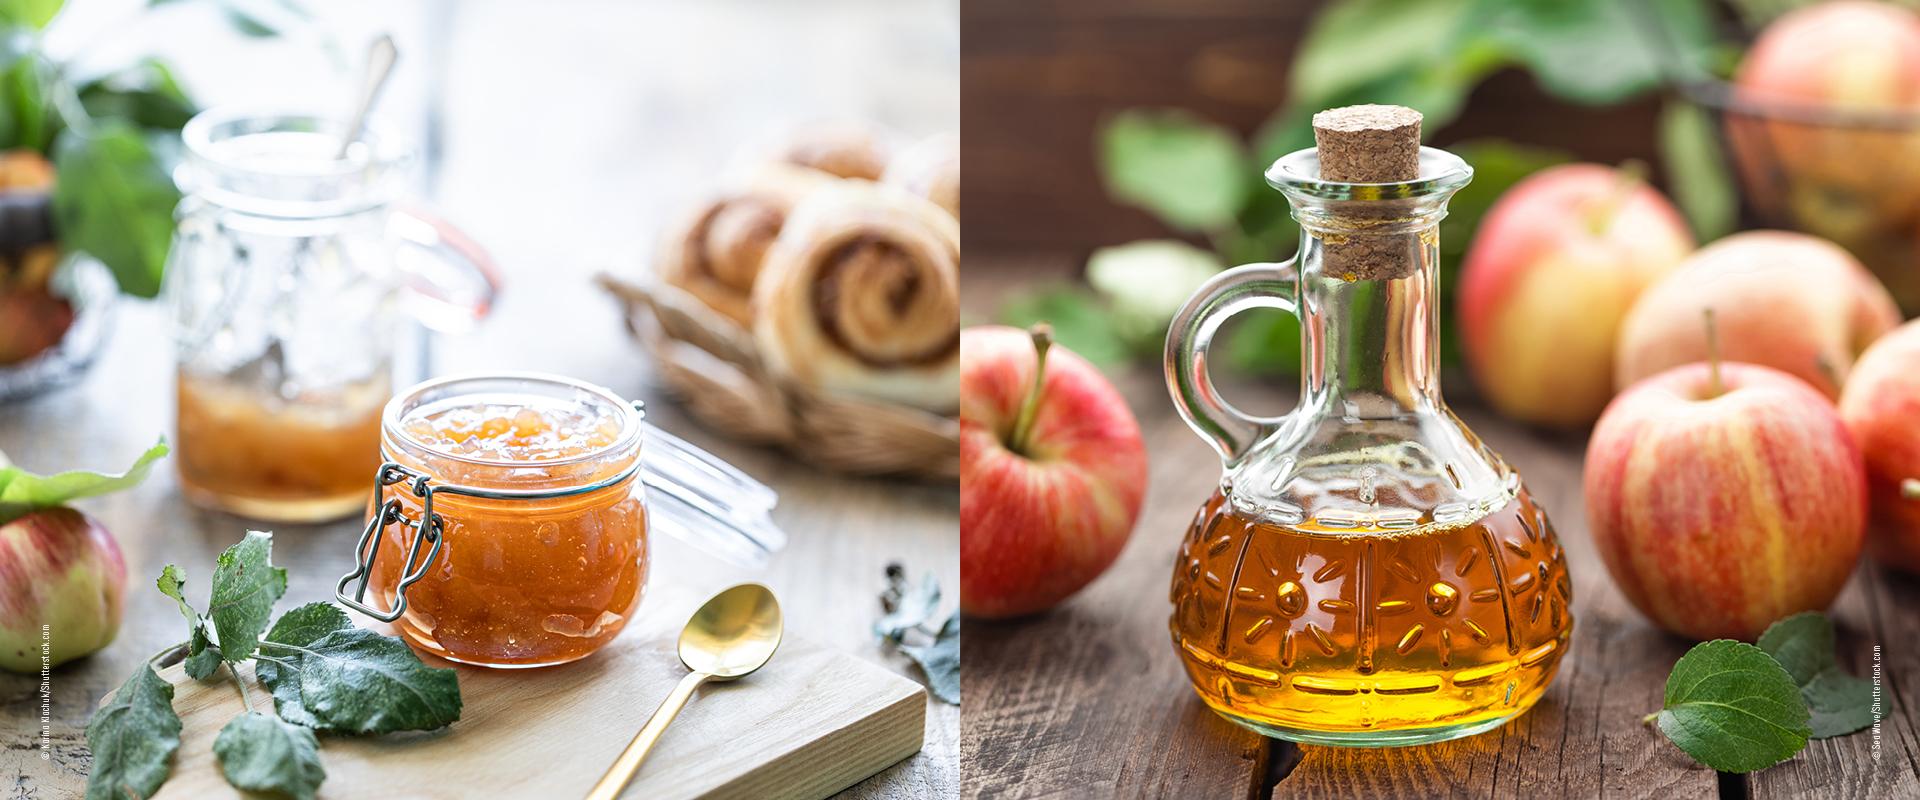 Apfel Chutney Apfelessig